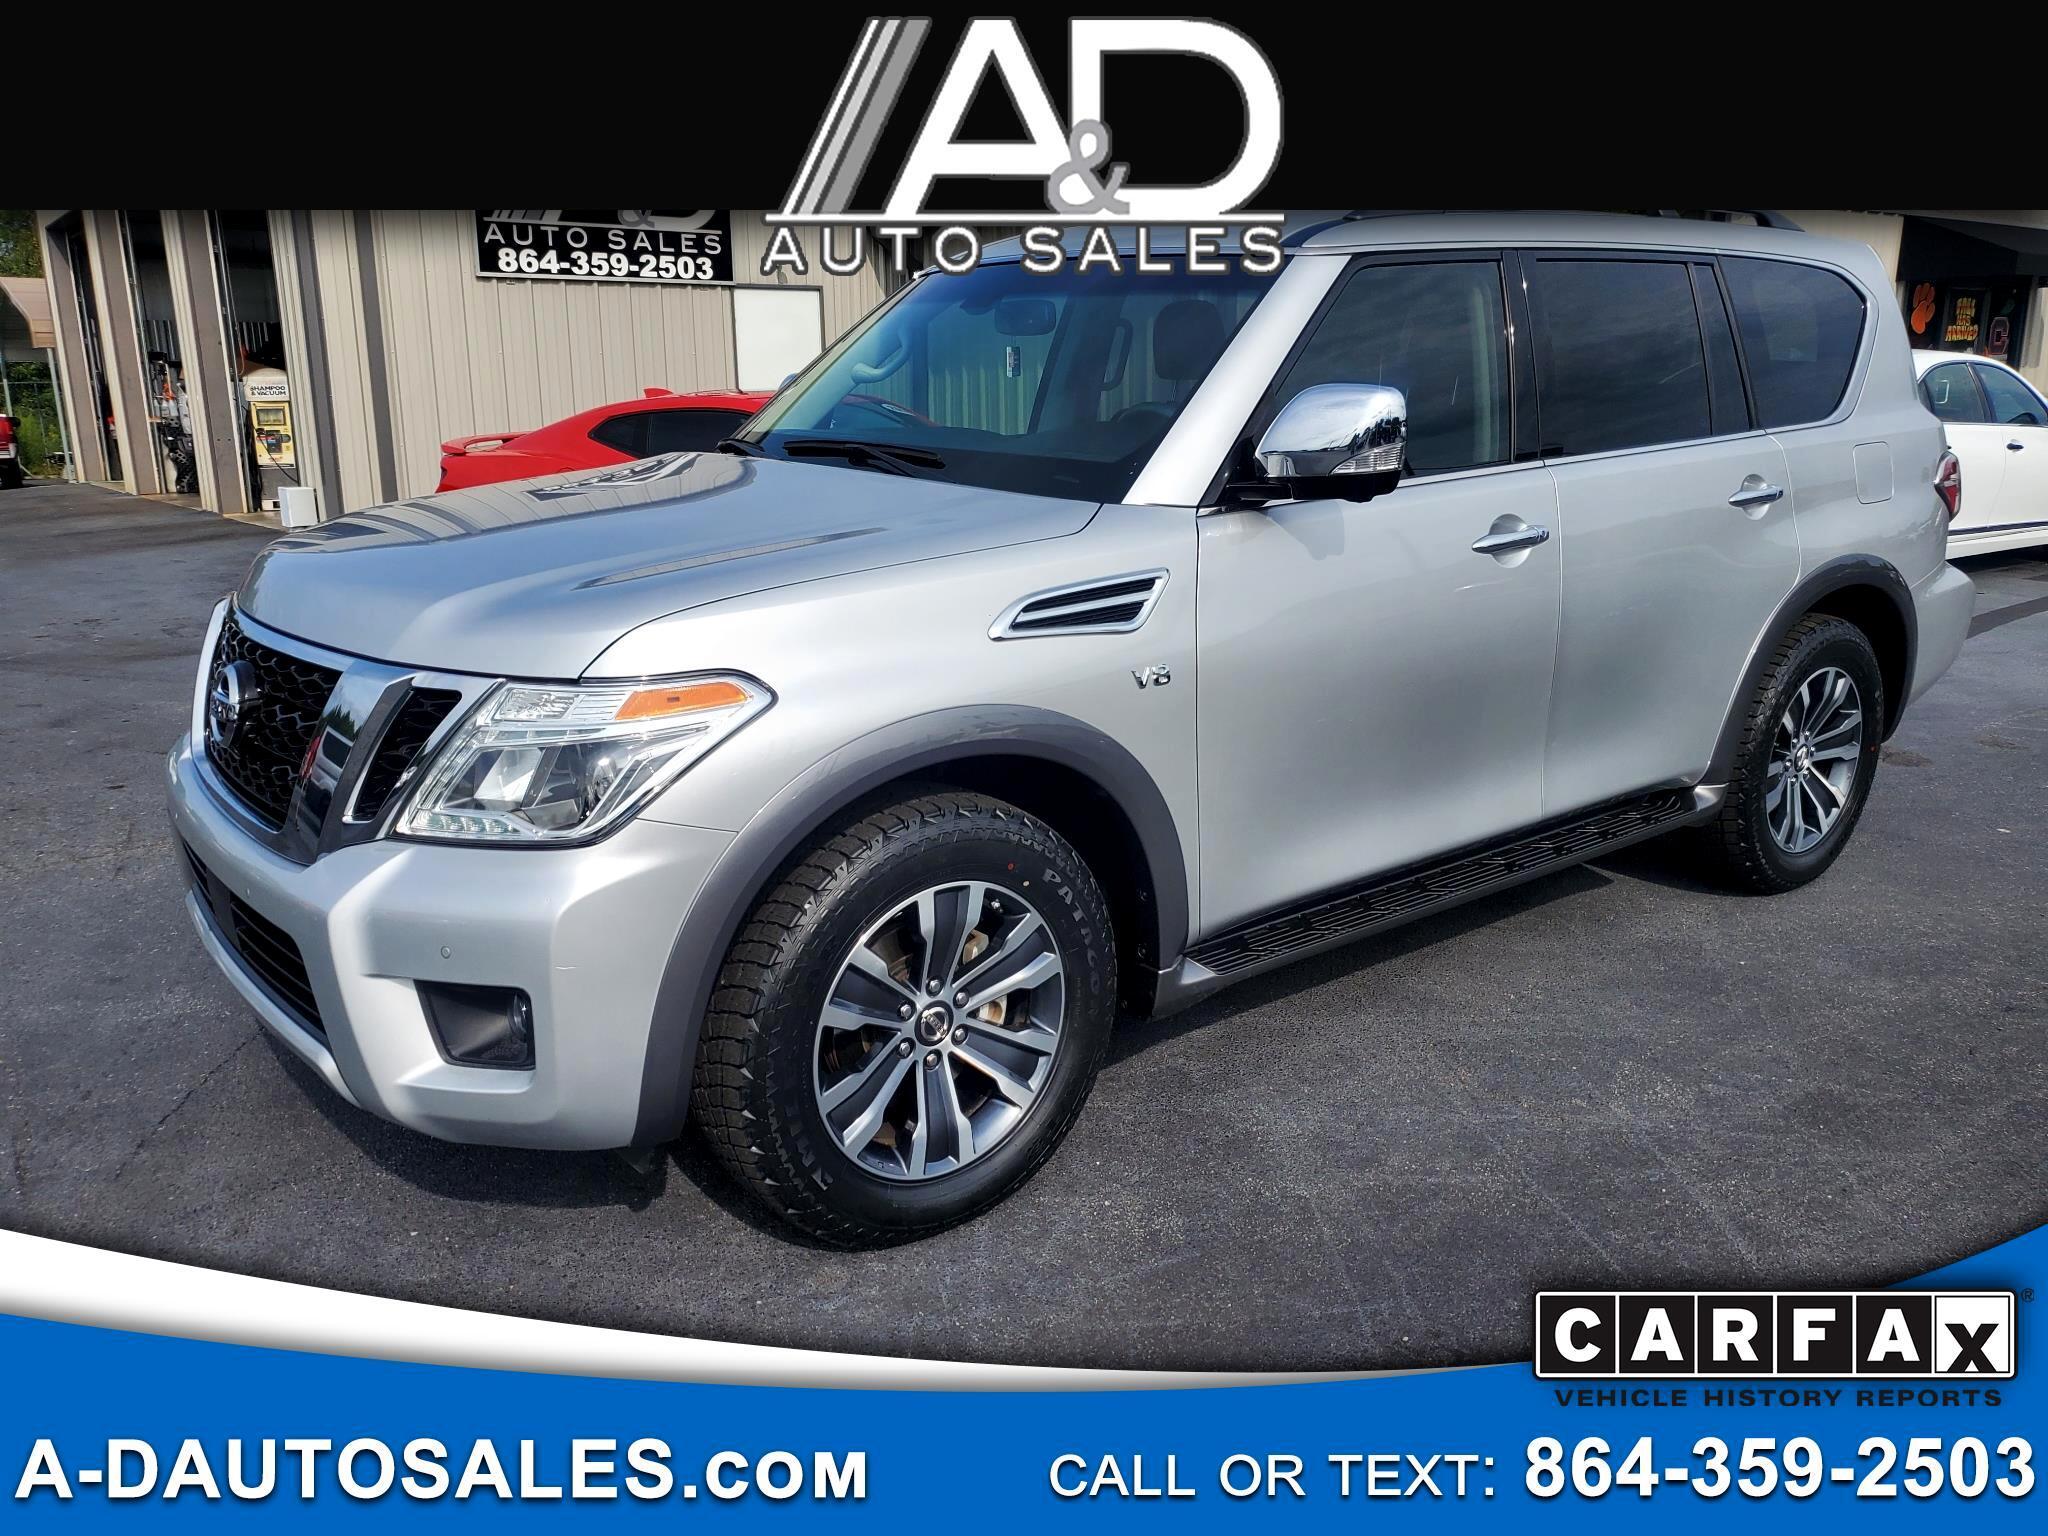 27+ D&A Auto Sales